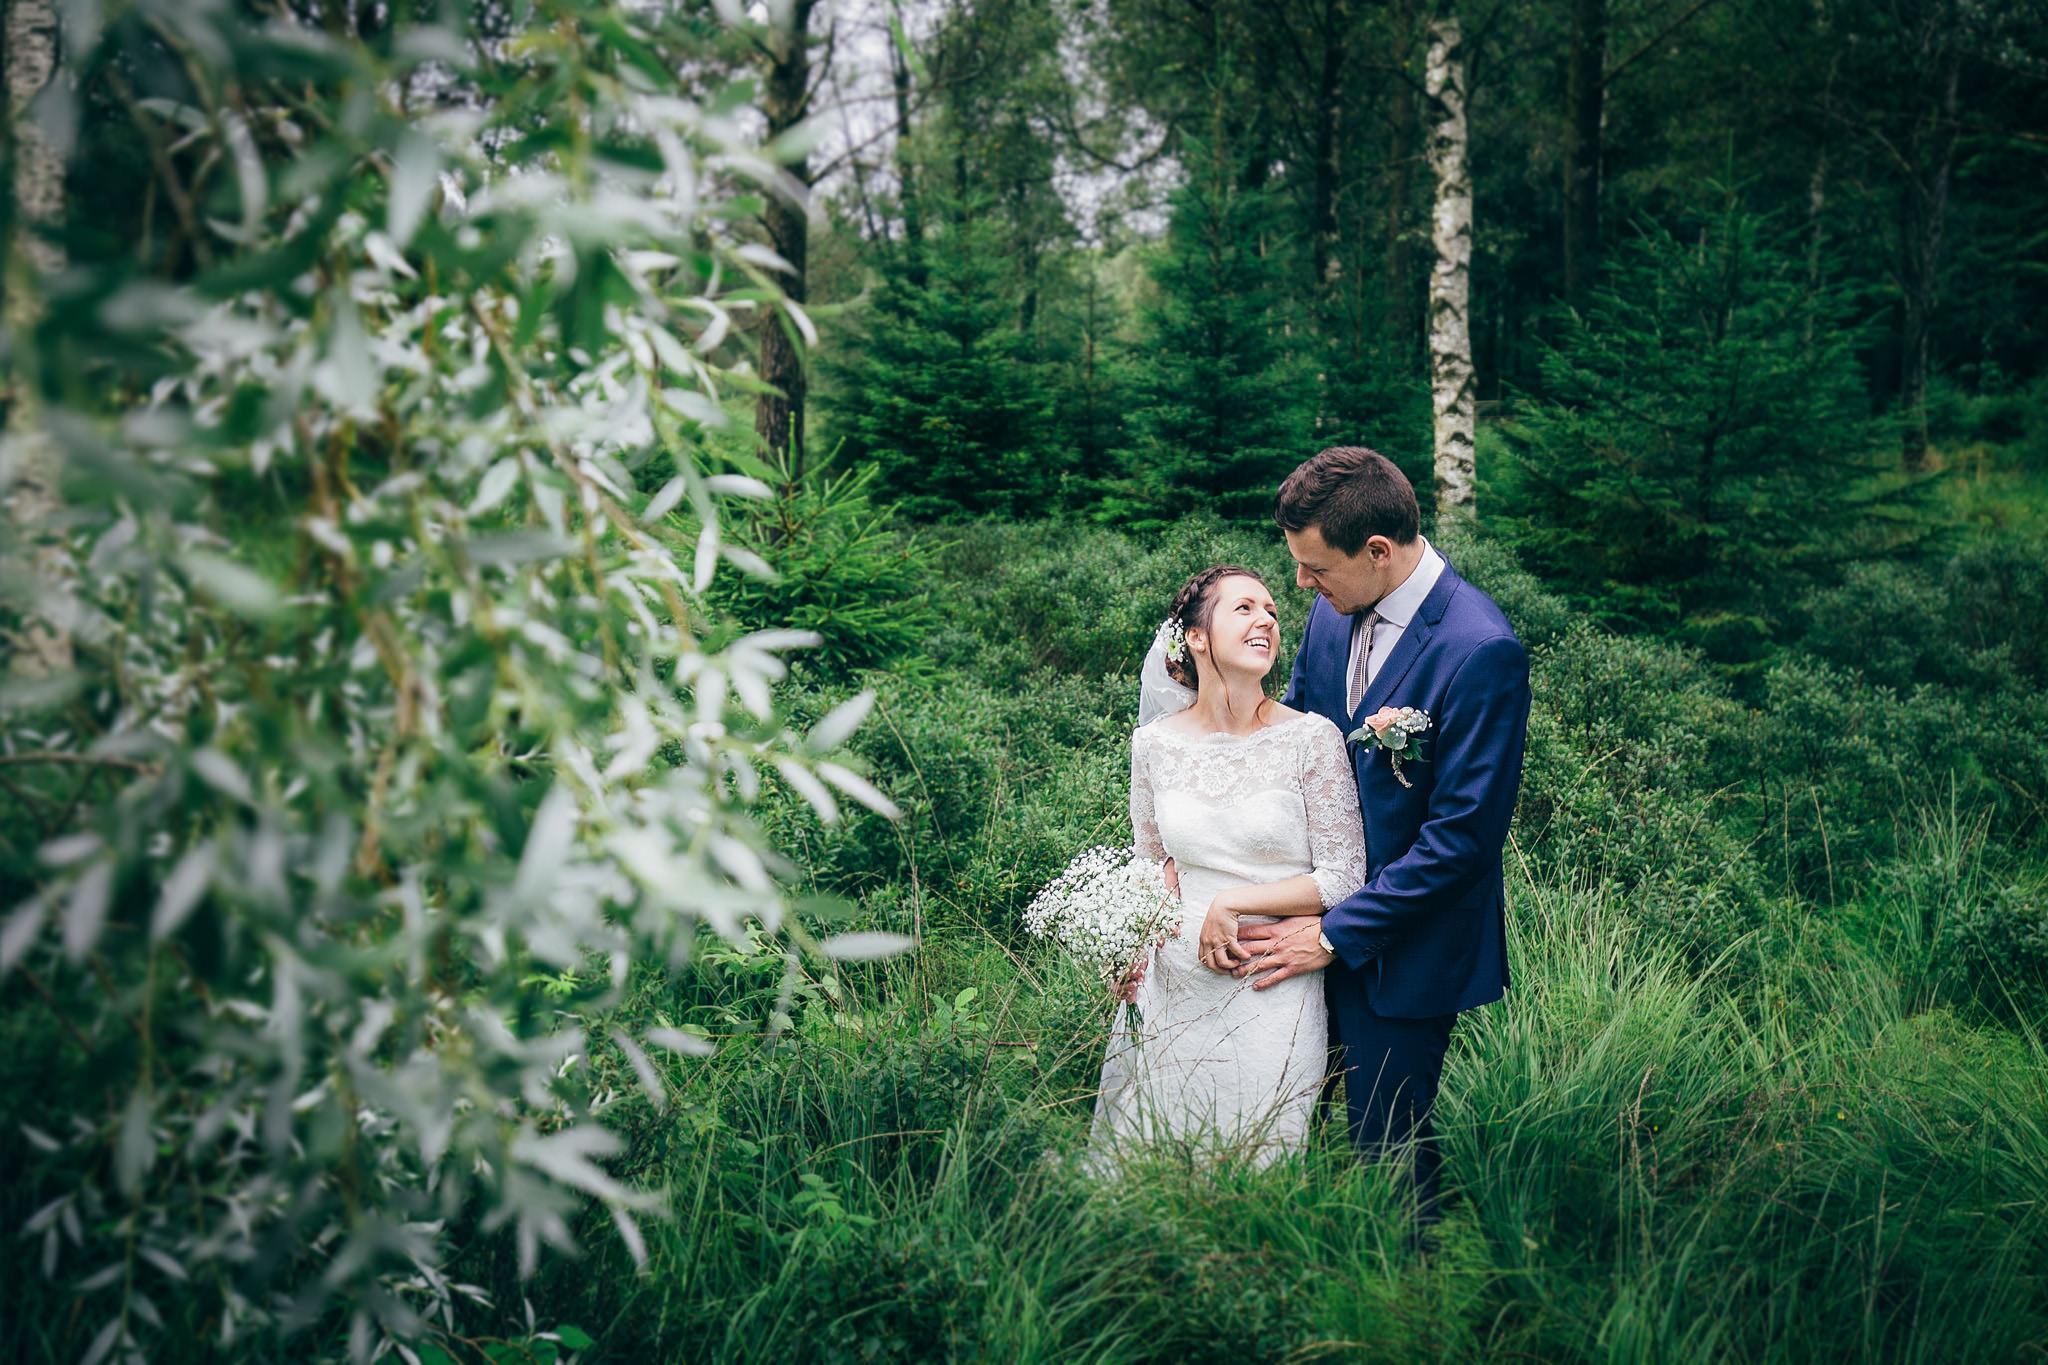 Norway+wedding+photographer+elopement+pre+wedding+Rogaland+bryllupsfotograf+Casey+Arneson-127.jpg